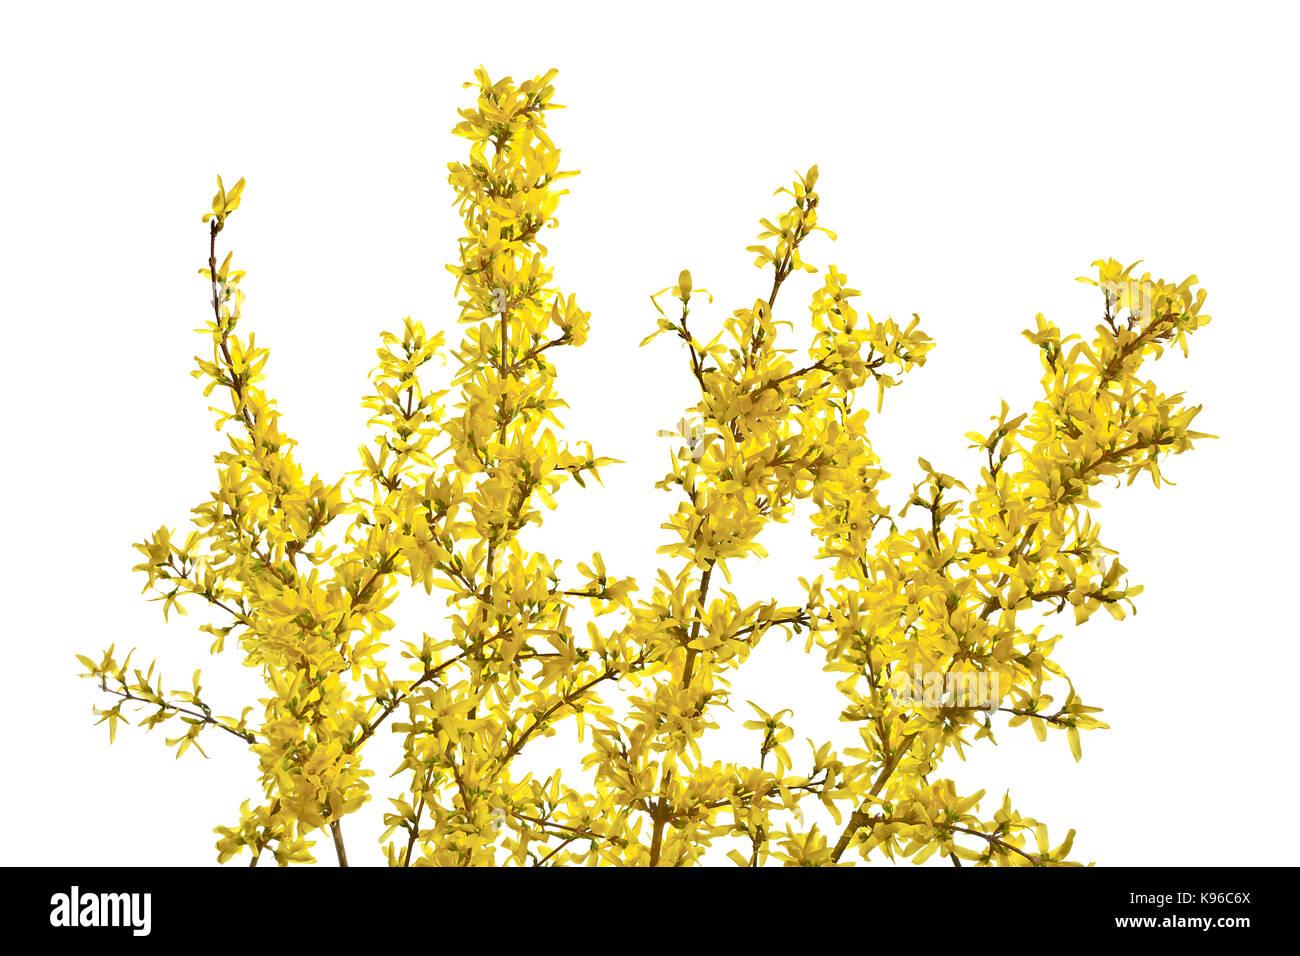 Yellow Flowers On Twigs Stock Photos Yellow Flowers On Twigs Stock